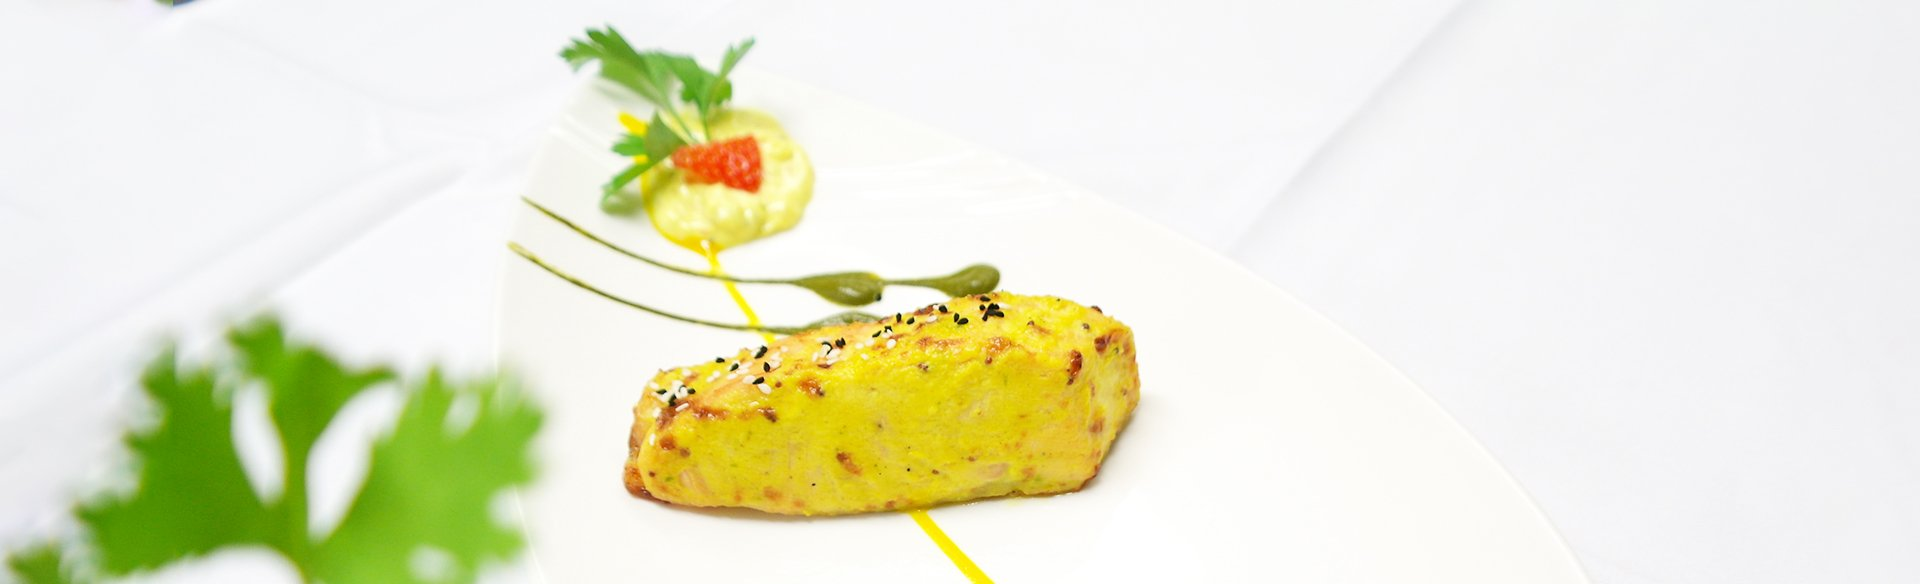 food-pic-1 - The 29029 Restaurant Wareham UK